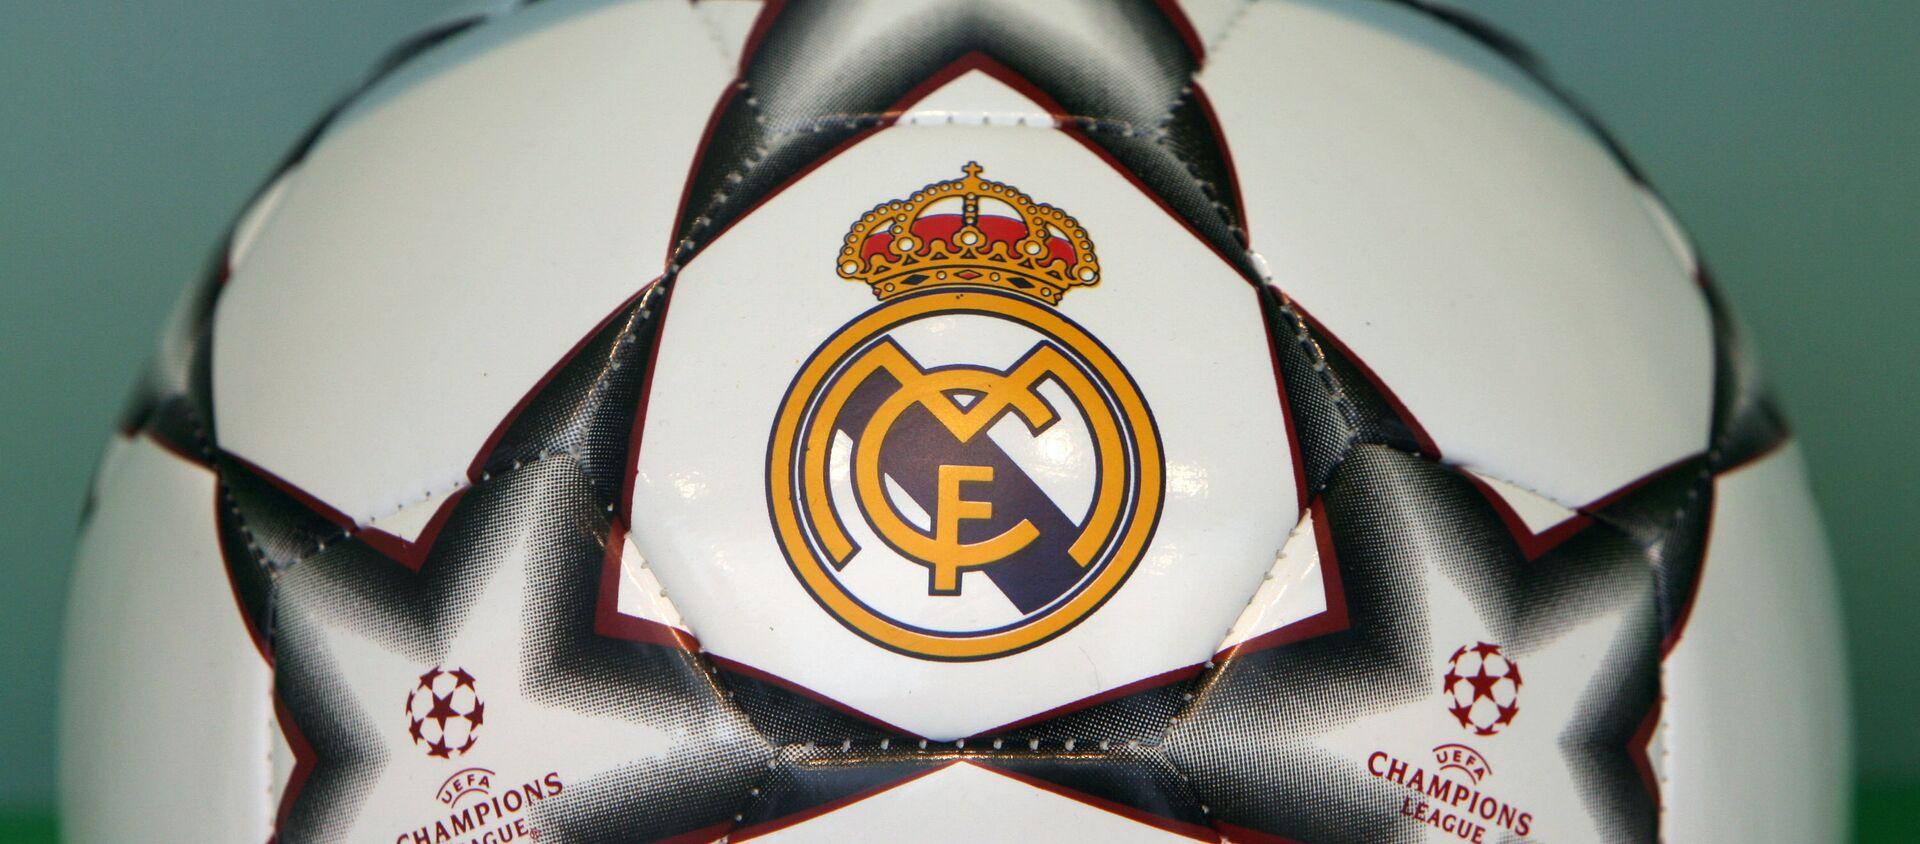 A Real Madrid Champions League football seen in a shop window in Madrid, 07 December 2006.  - Sputnik Mundo, 1920, 06.03.2020